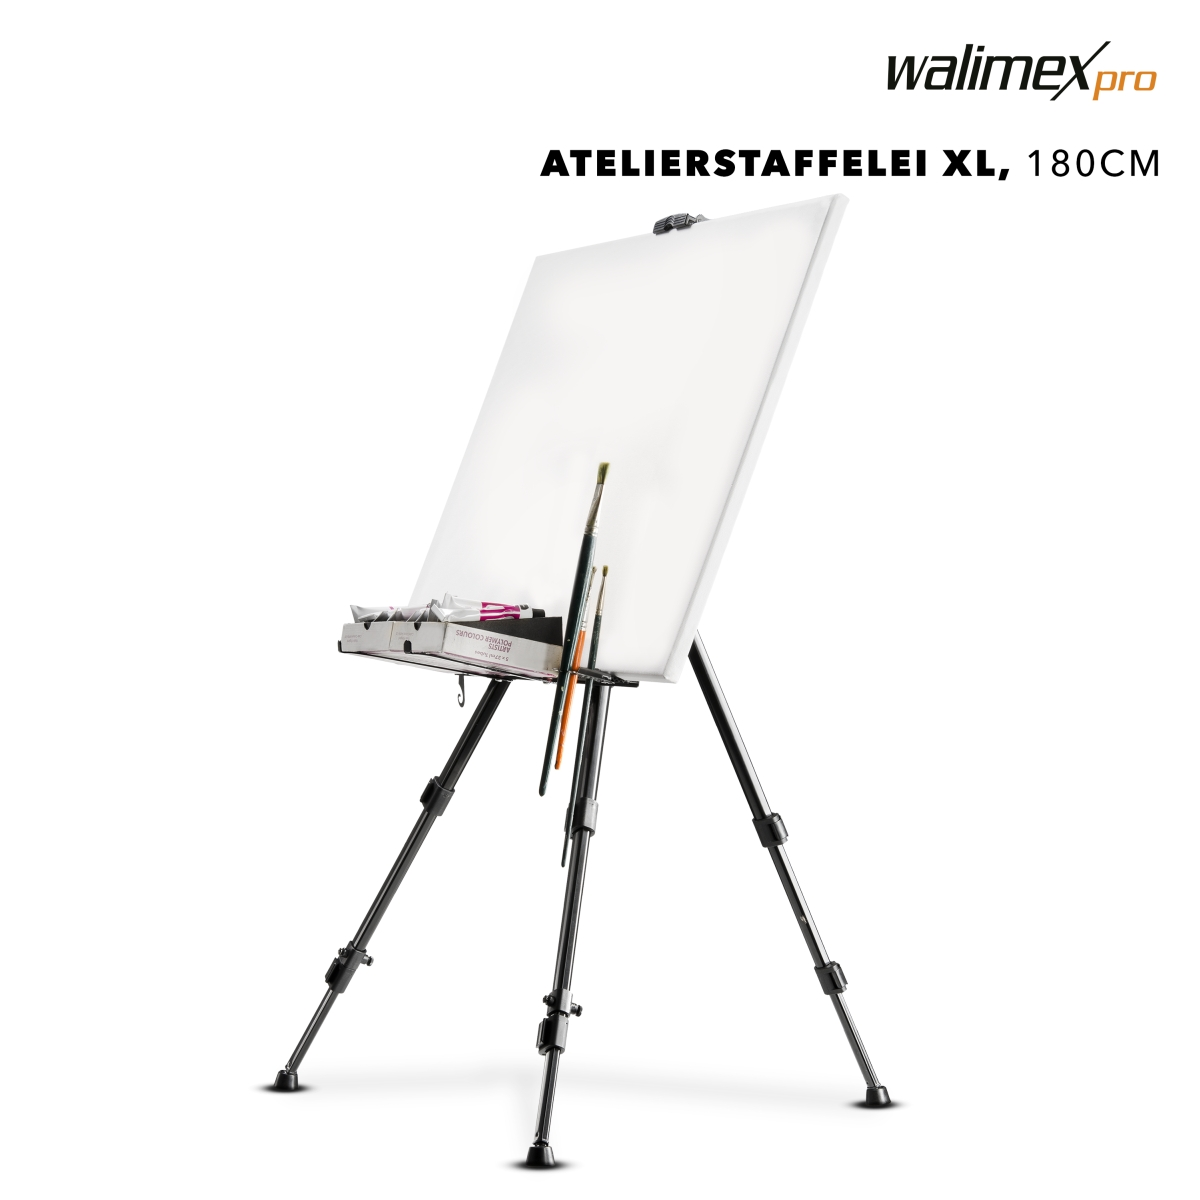 Walimex pro Studio Easel XL 180cm